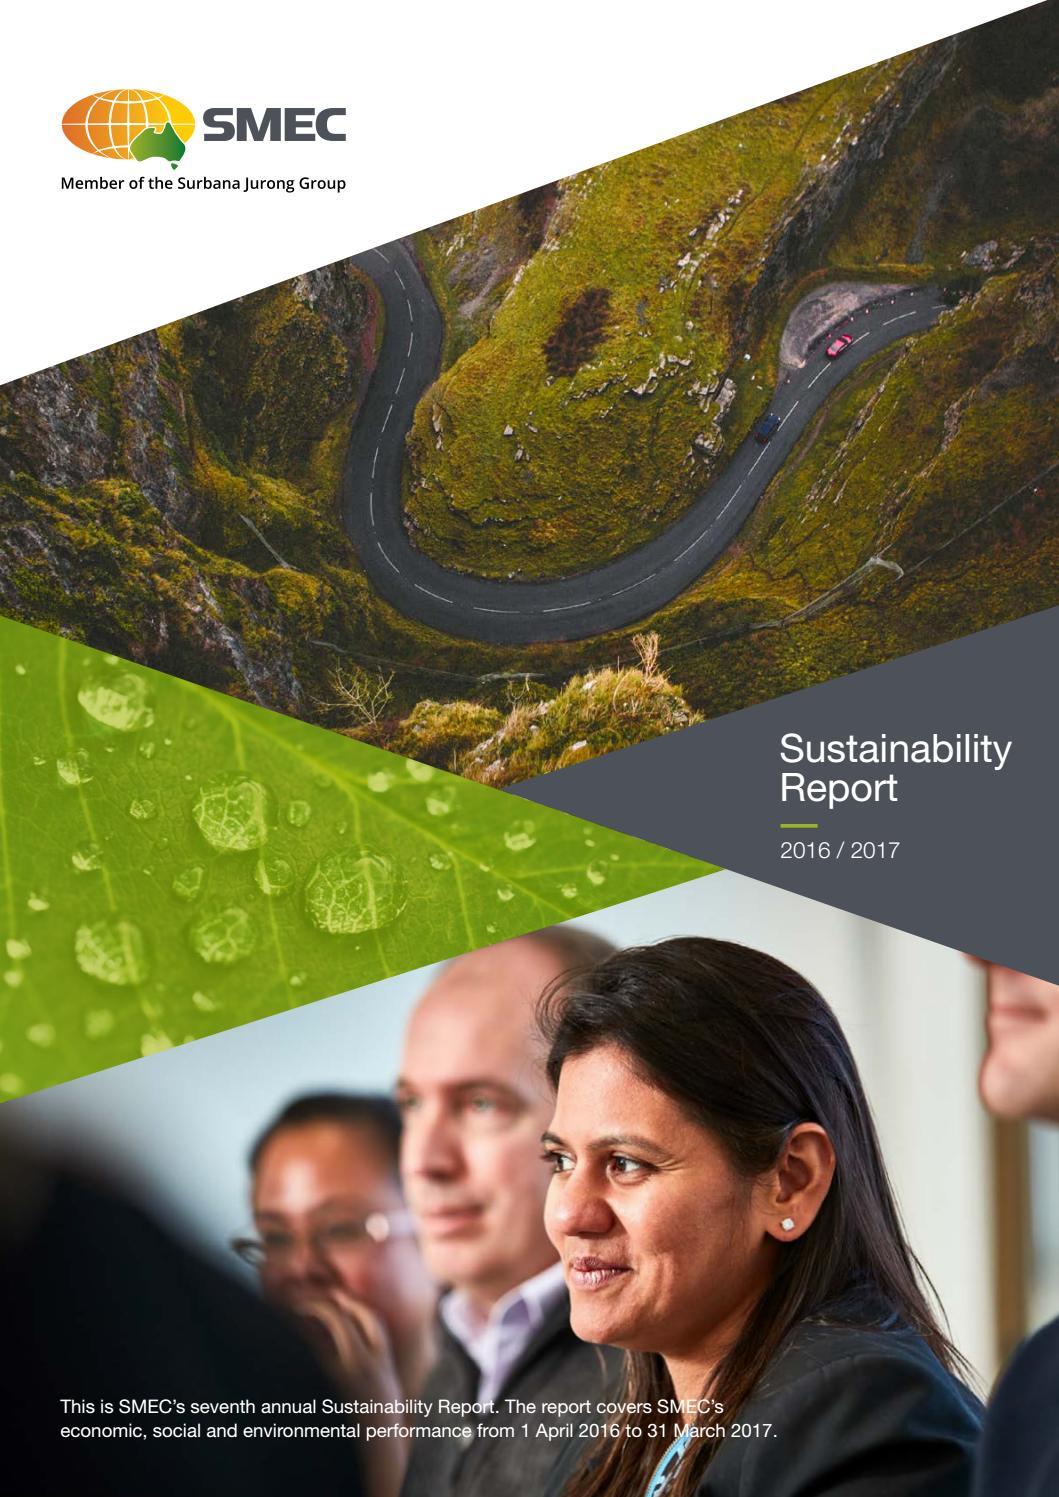 SMEC Sustainability Report 2017 by SMEC - issuu